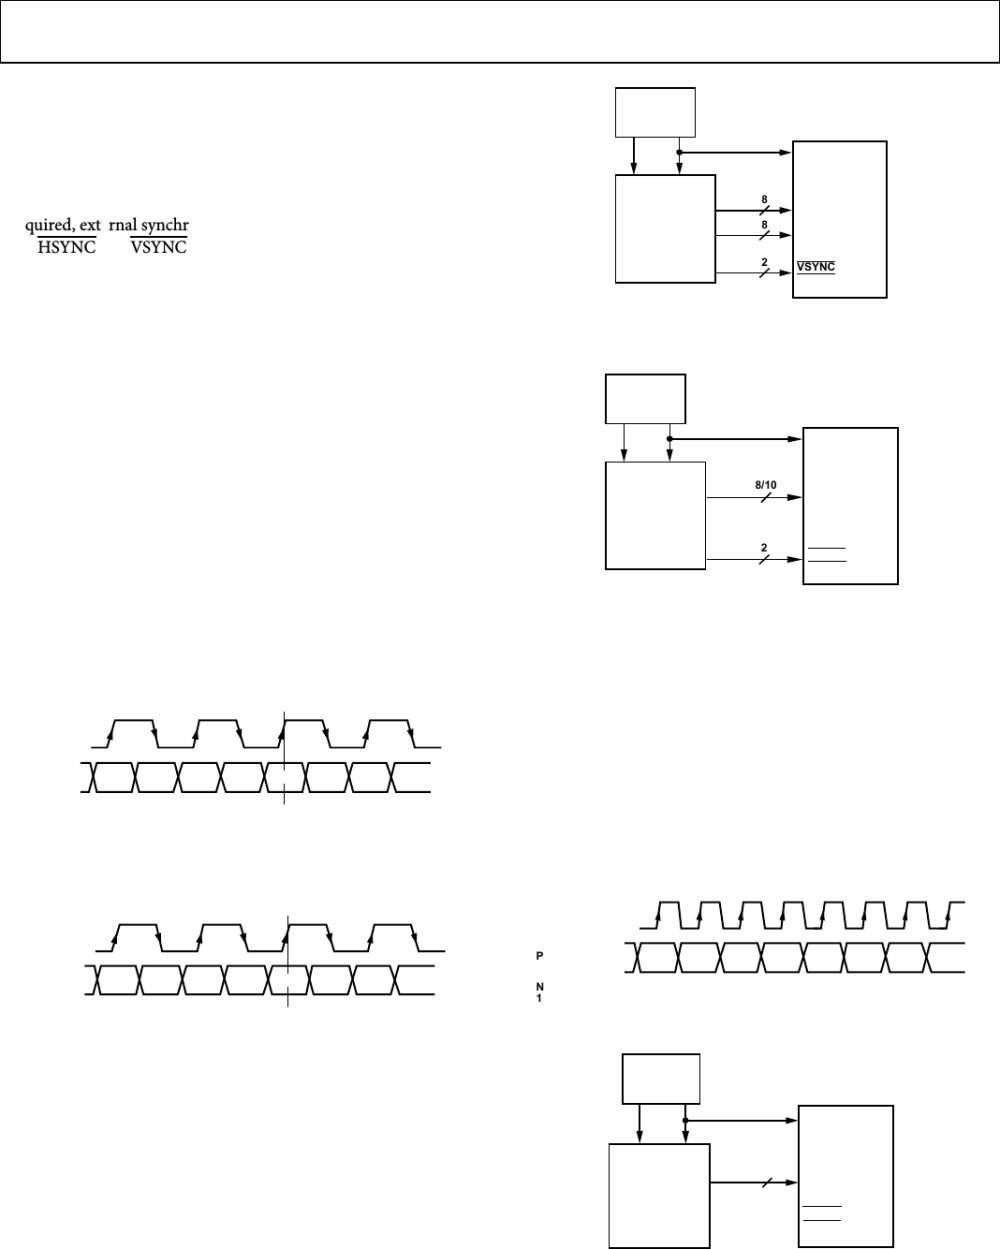 medium resolution of telephone wiring diagram for tran 2012a wiring diagram databaseadv7390 93 datasheet analog devices digikey telephone wiring